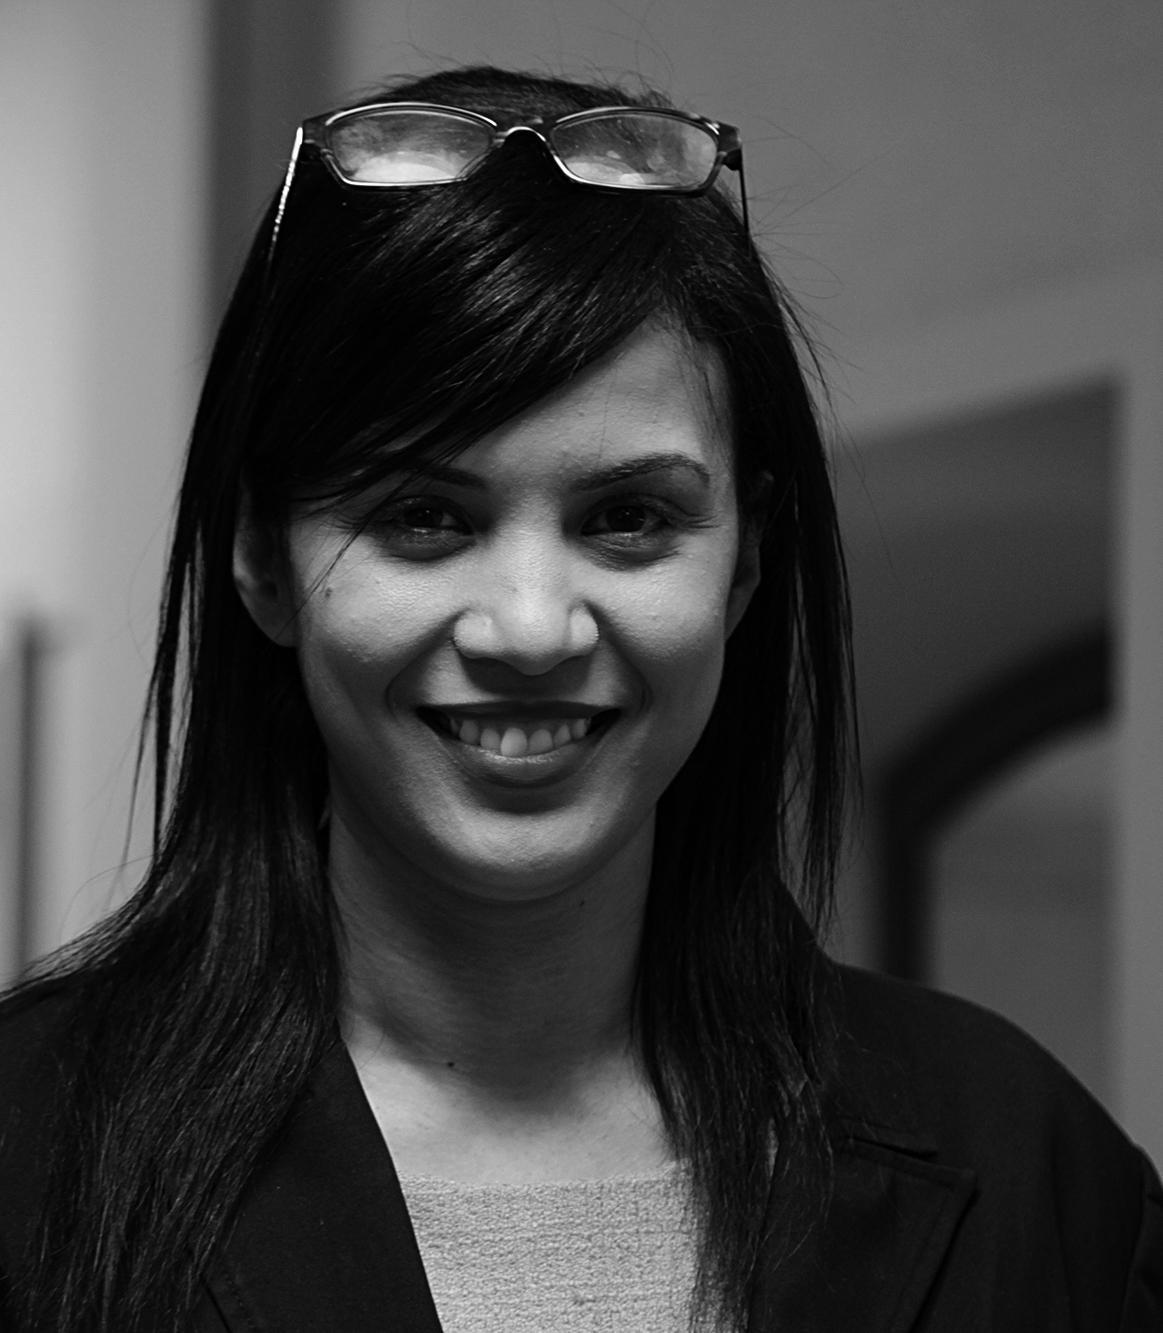 Selma Ben Fadhel